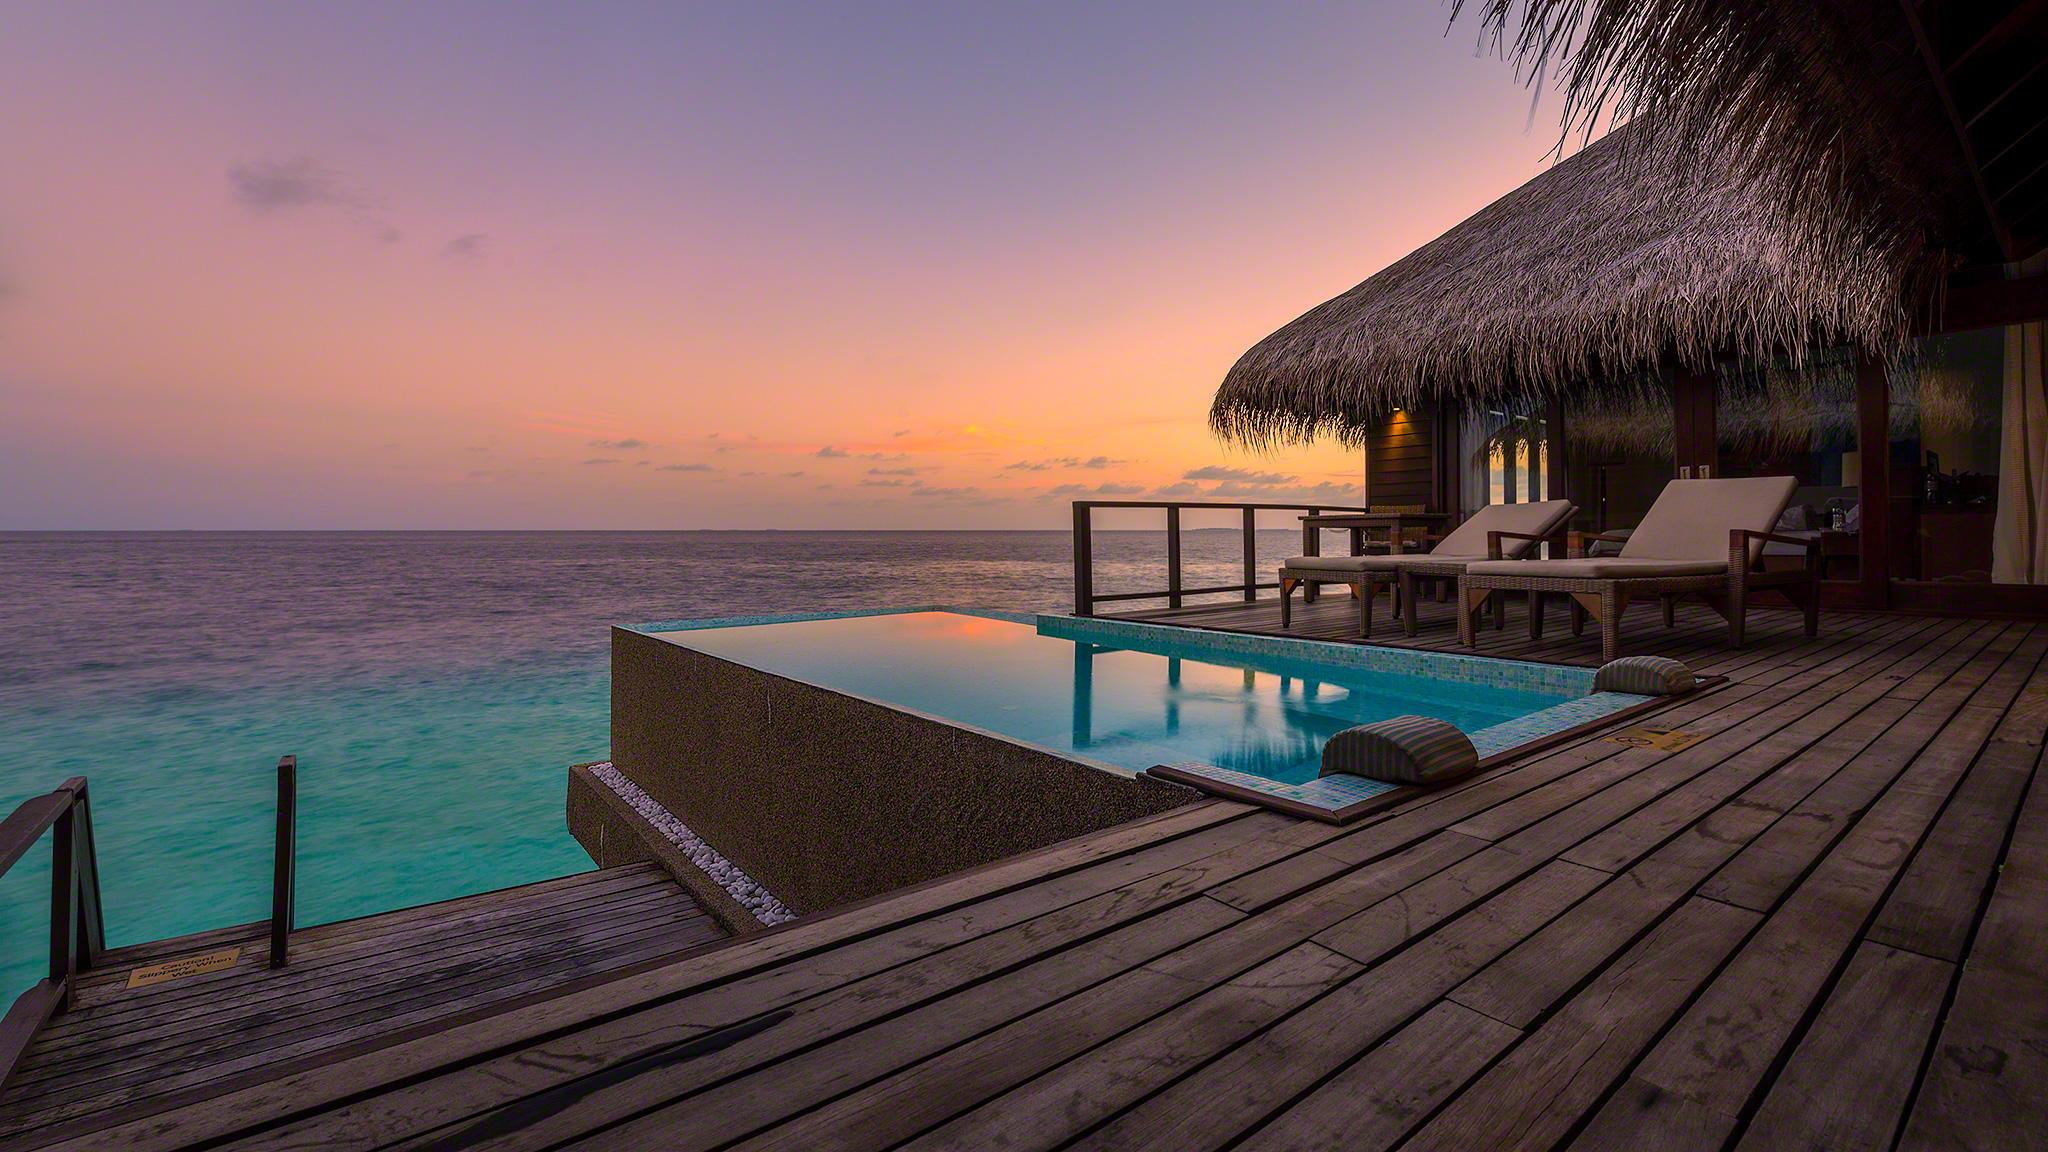 location villa ile maurice comment choisir indian ocean